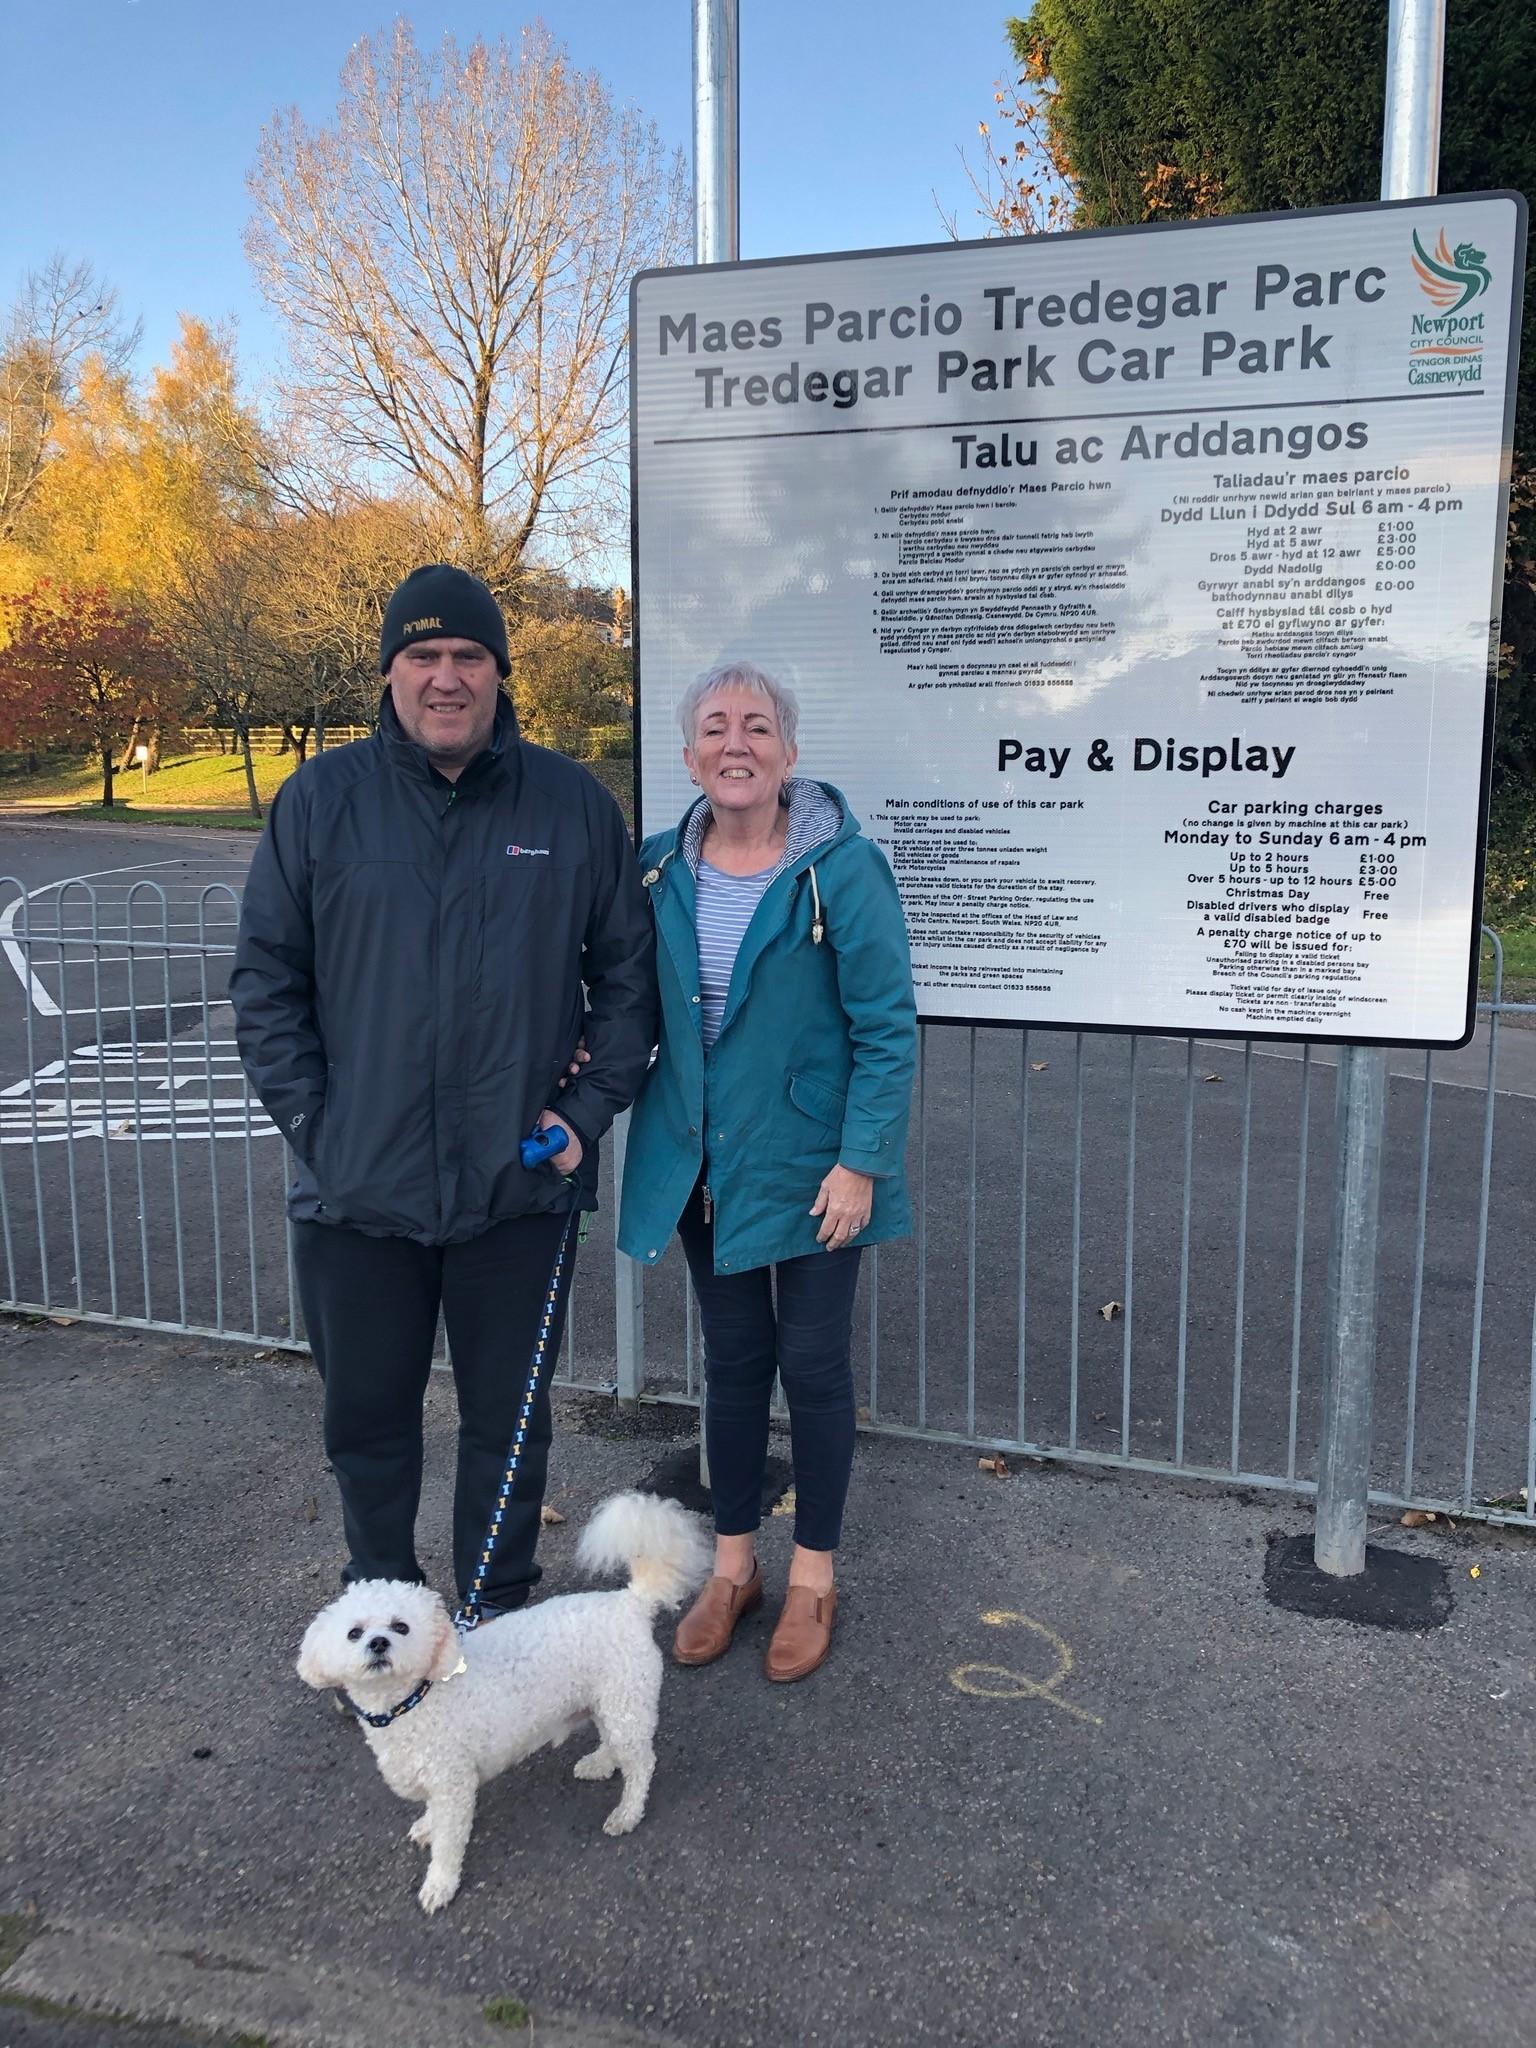 Dog-walking group will split up after Tredegar Park starts parking charges